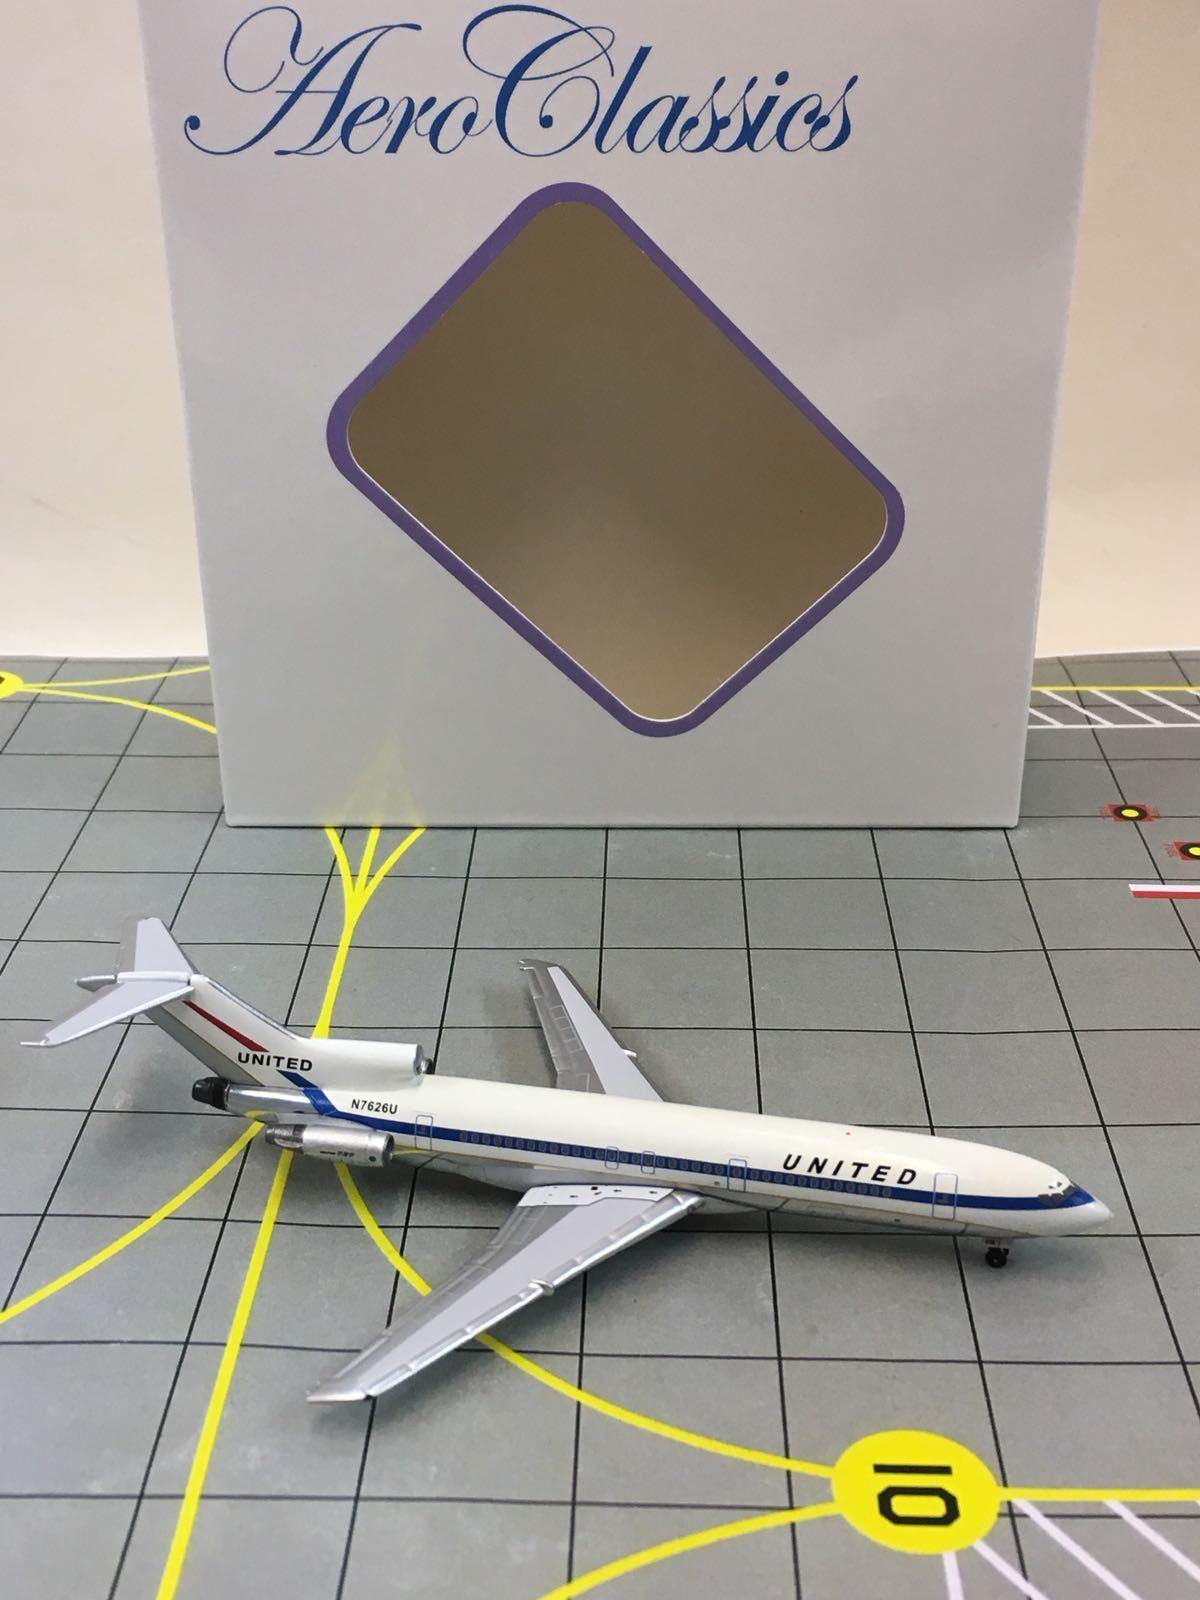 RARE AeroClassics 1 400 United Airlines Boeing 727-200 N7626U